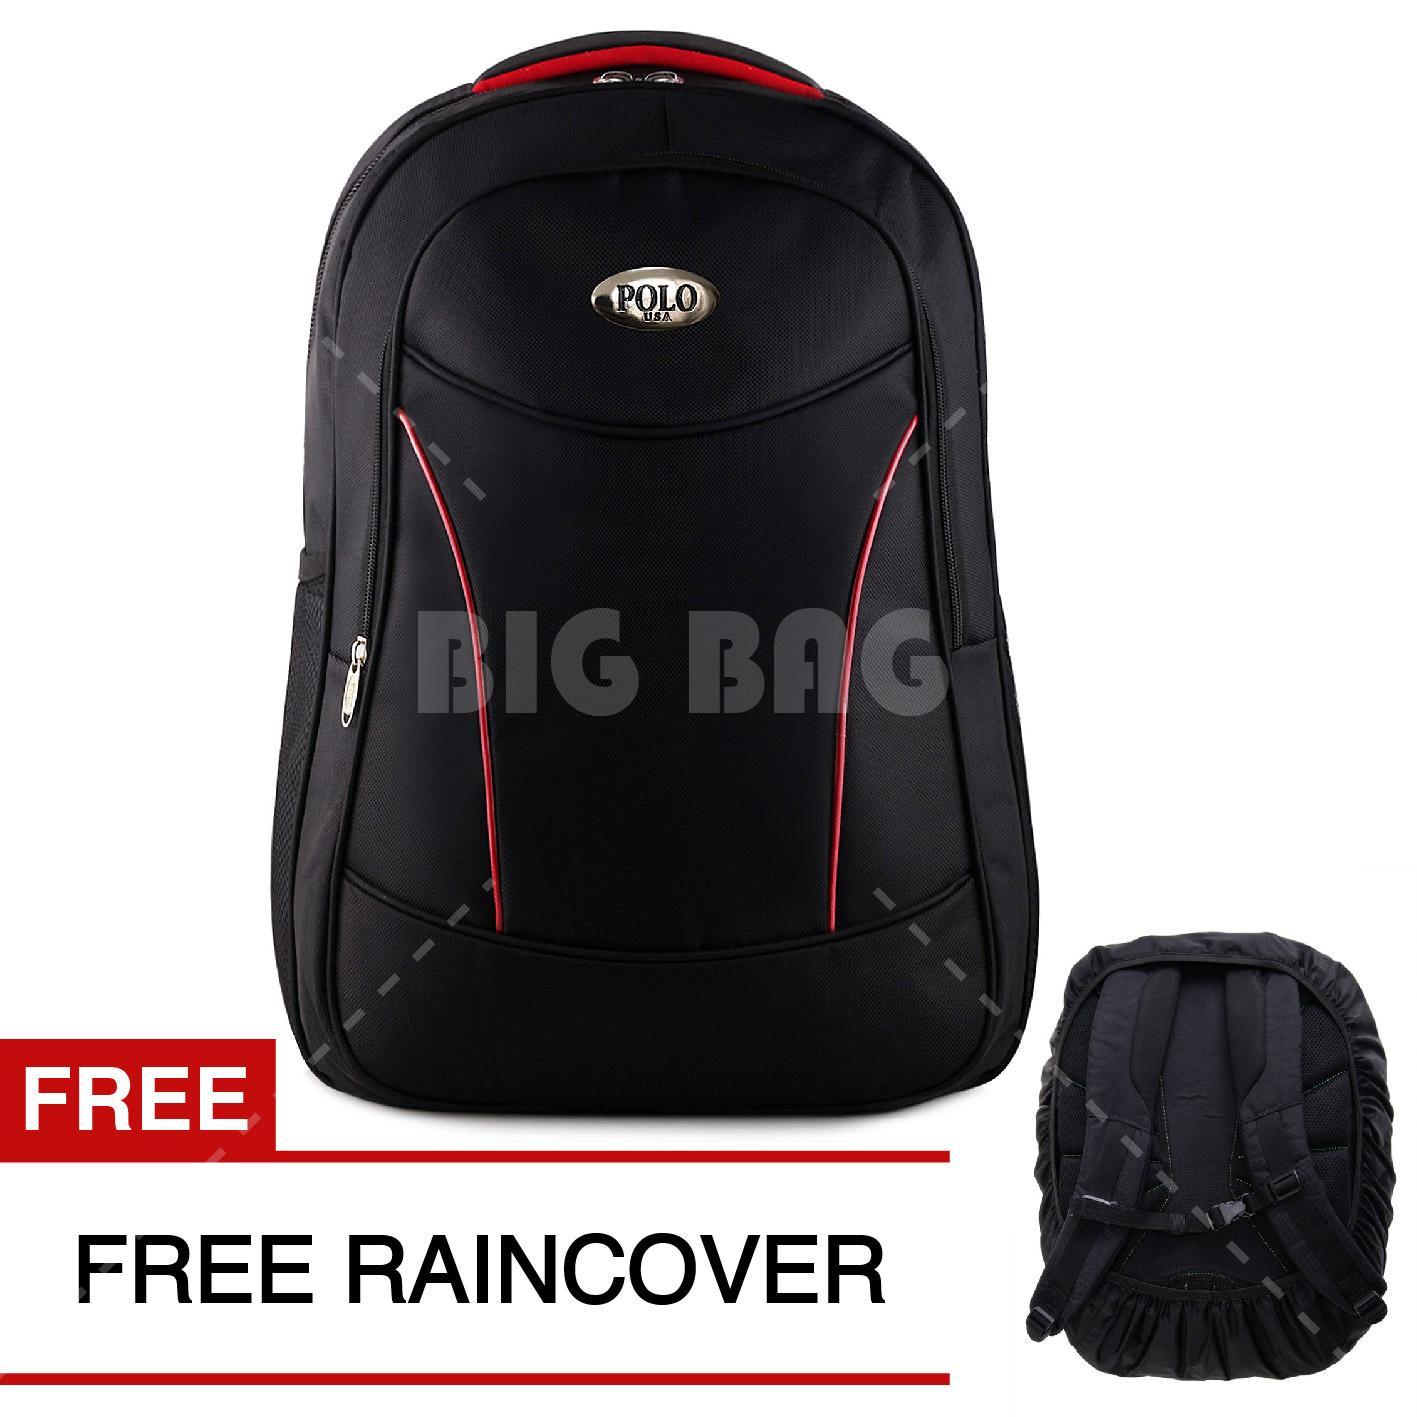 Tas Ransel Polo USA Black Vertex VT Tas Laptop Backpack + FREE Raincover Tas Pria Tas Kerja Tas Sekolah Tas Fashion Pria